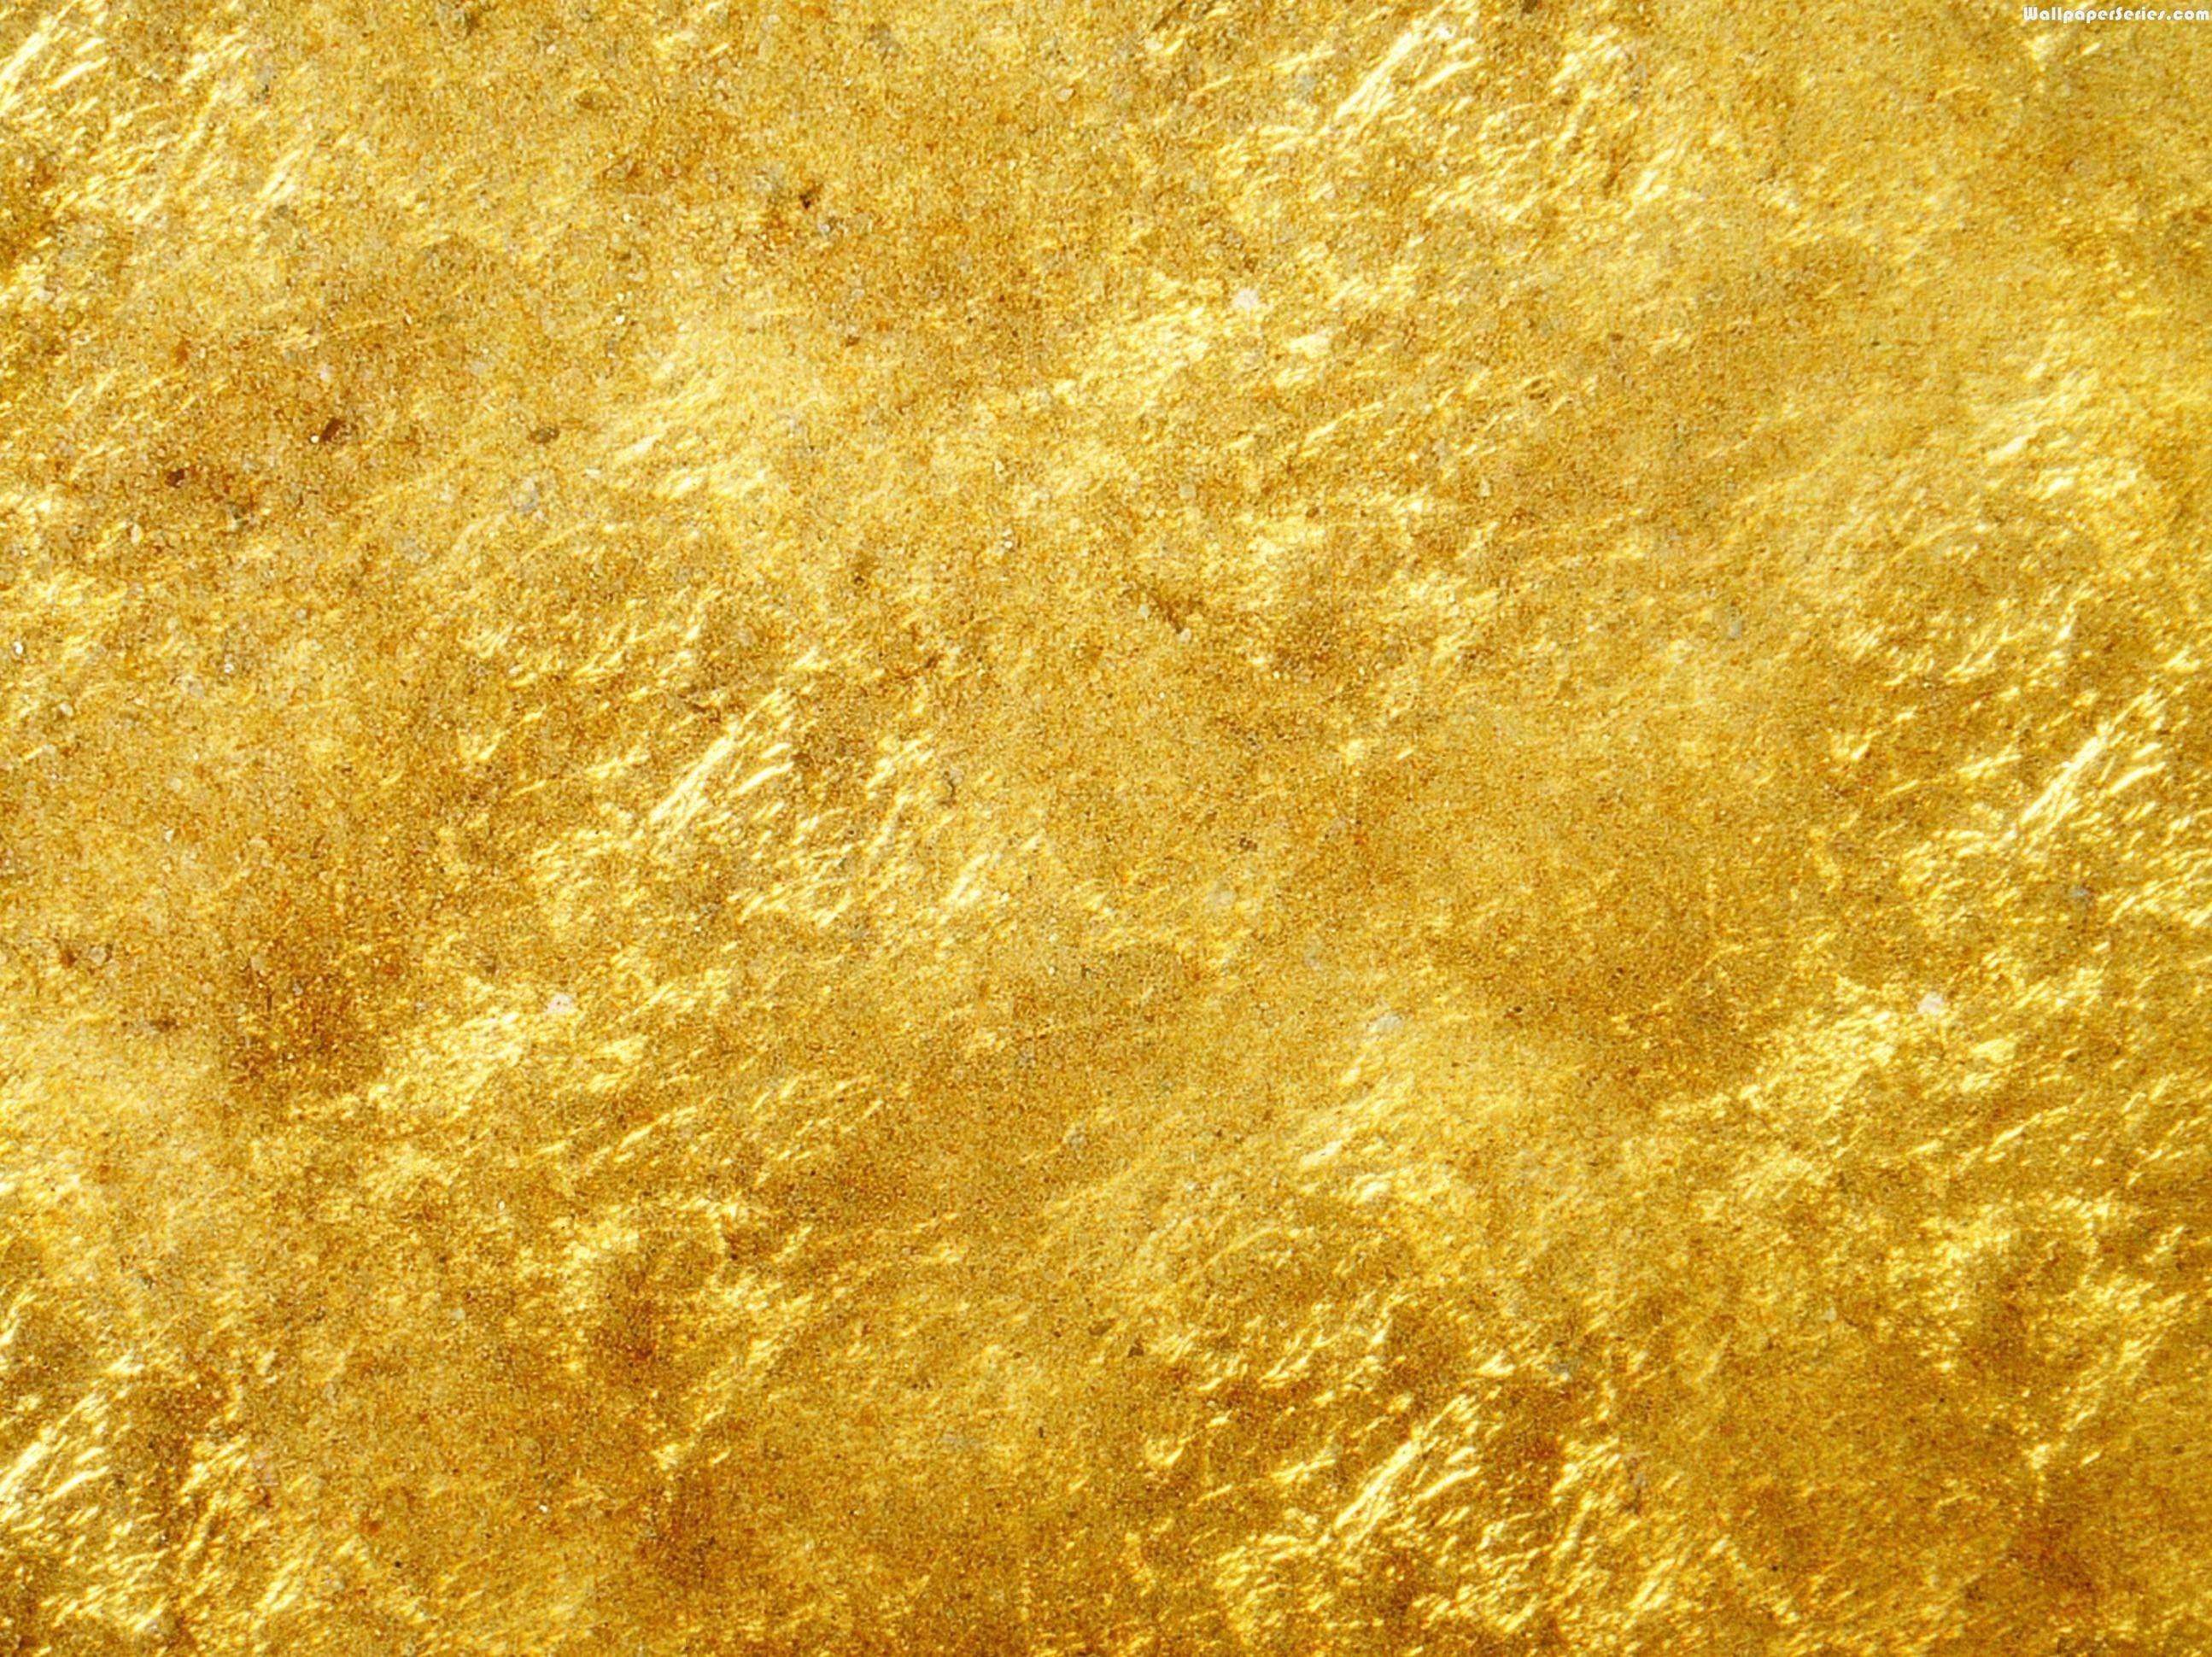 2590×1940, Gold, Texture, Backgrounds, Textures, Wallpaper